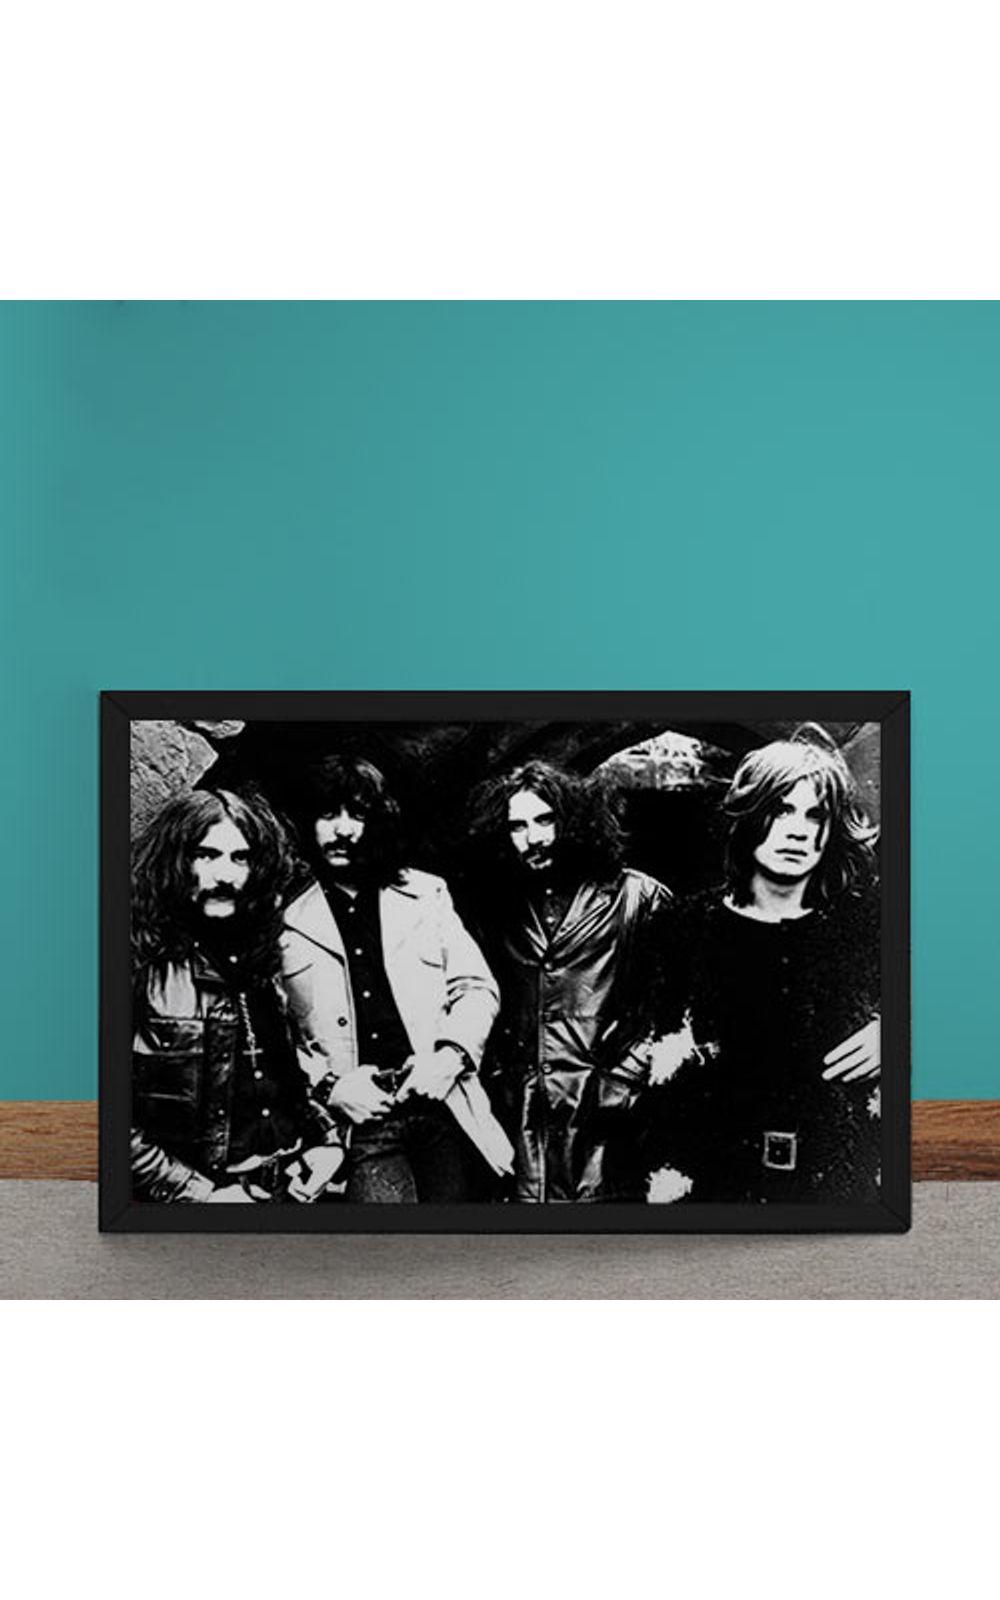 Foto 1 - Quadro Decorativo Black Sabbath Fotografia Antiga